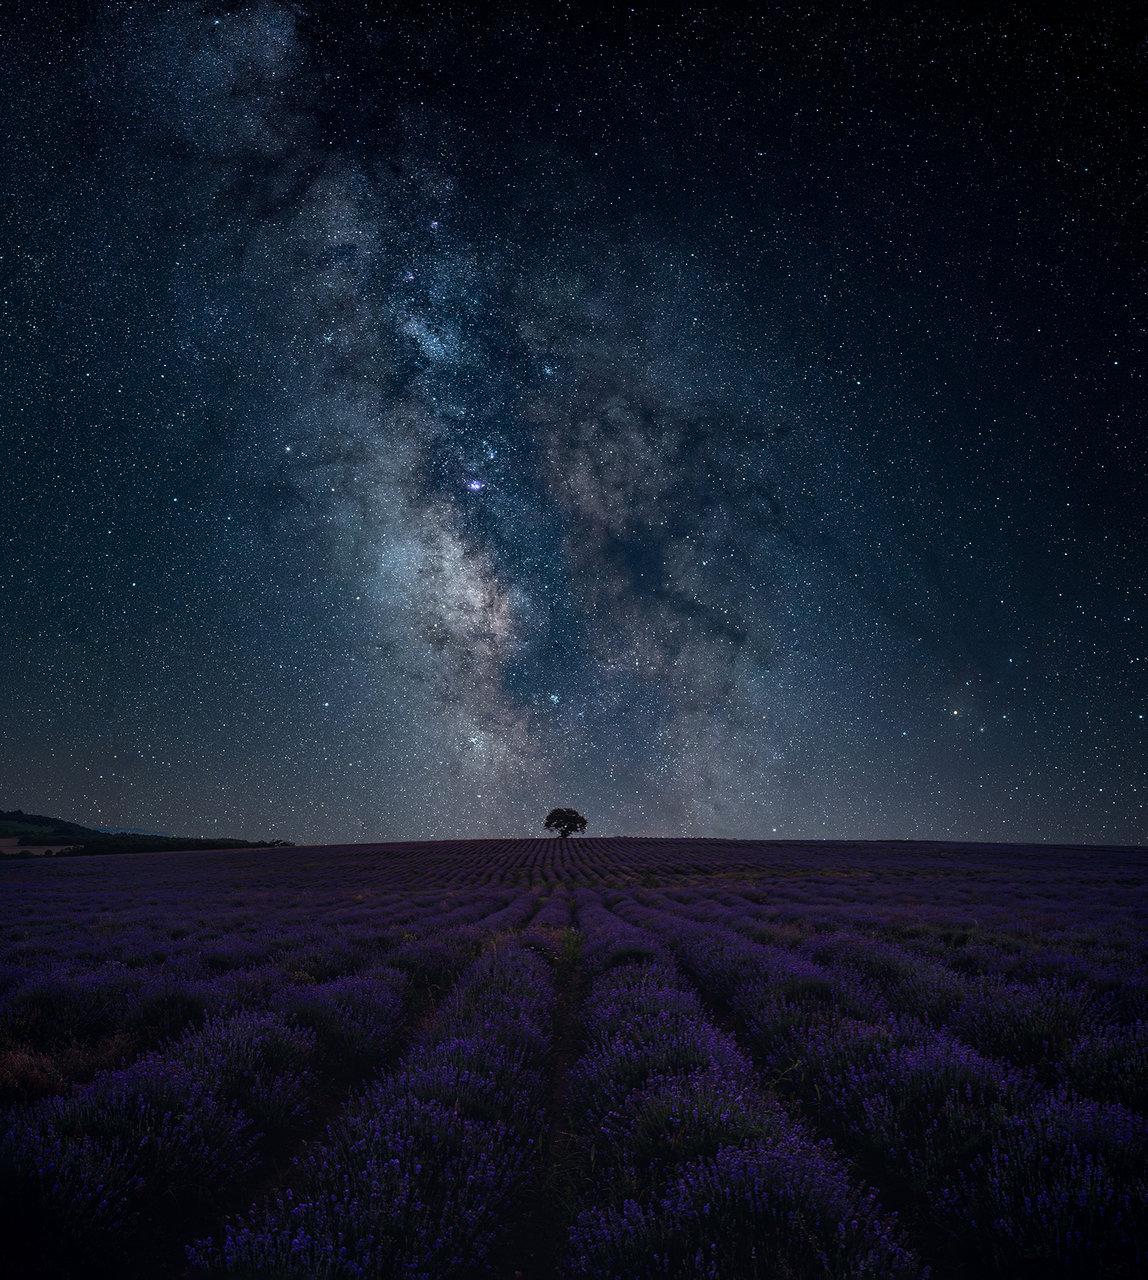 Lavender от Tsvetelin Iliev - C3ck0